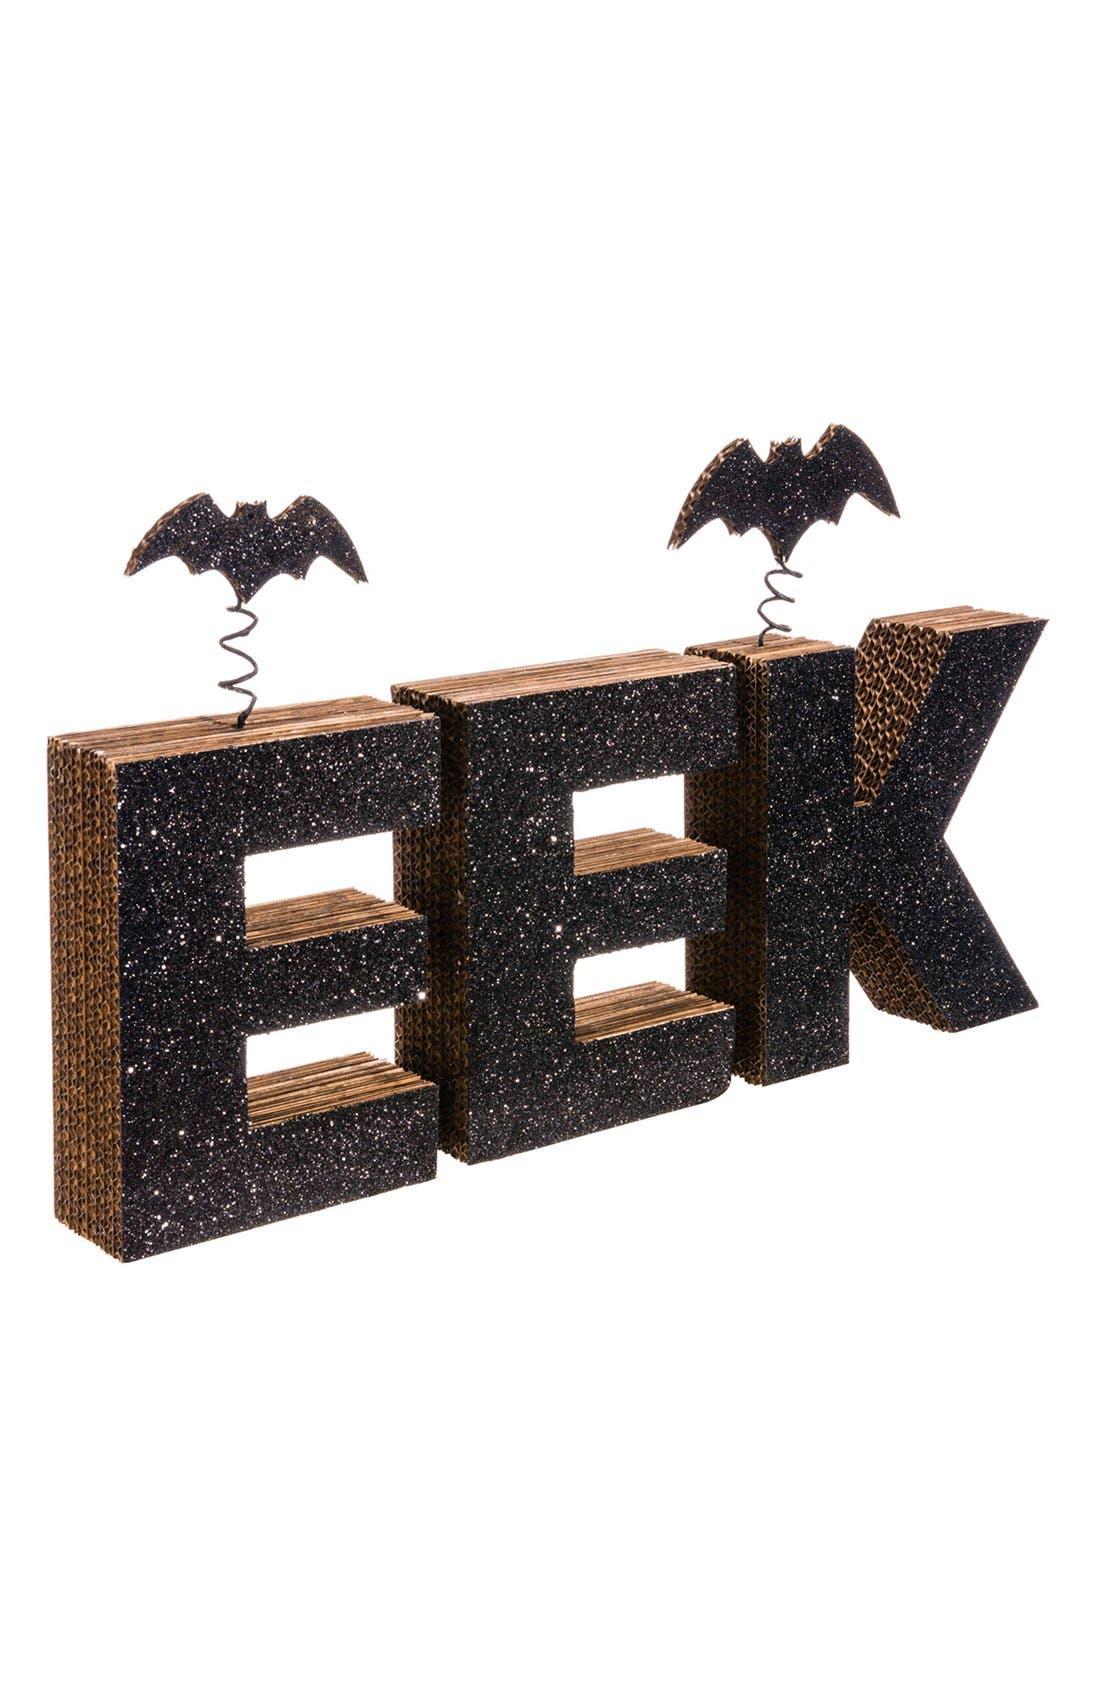 Alternate Image 1 Selected - ALLSTATE 'Eek' Bat Decoration